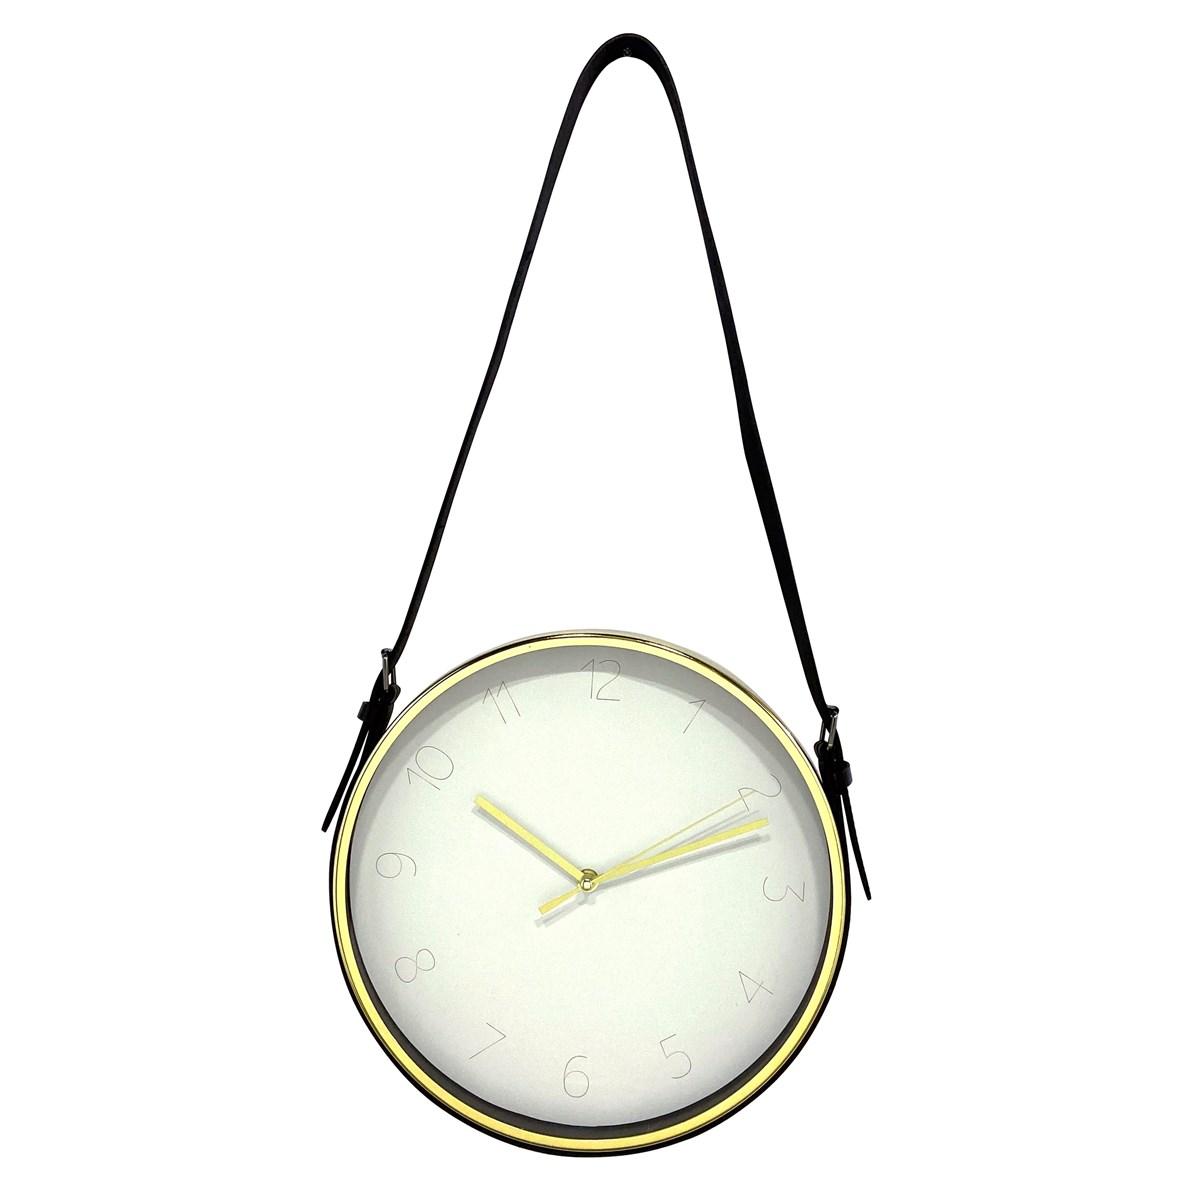 Horloge laniere en Métal Blanc